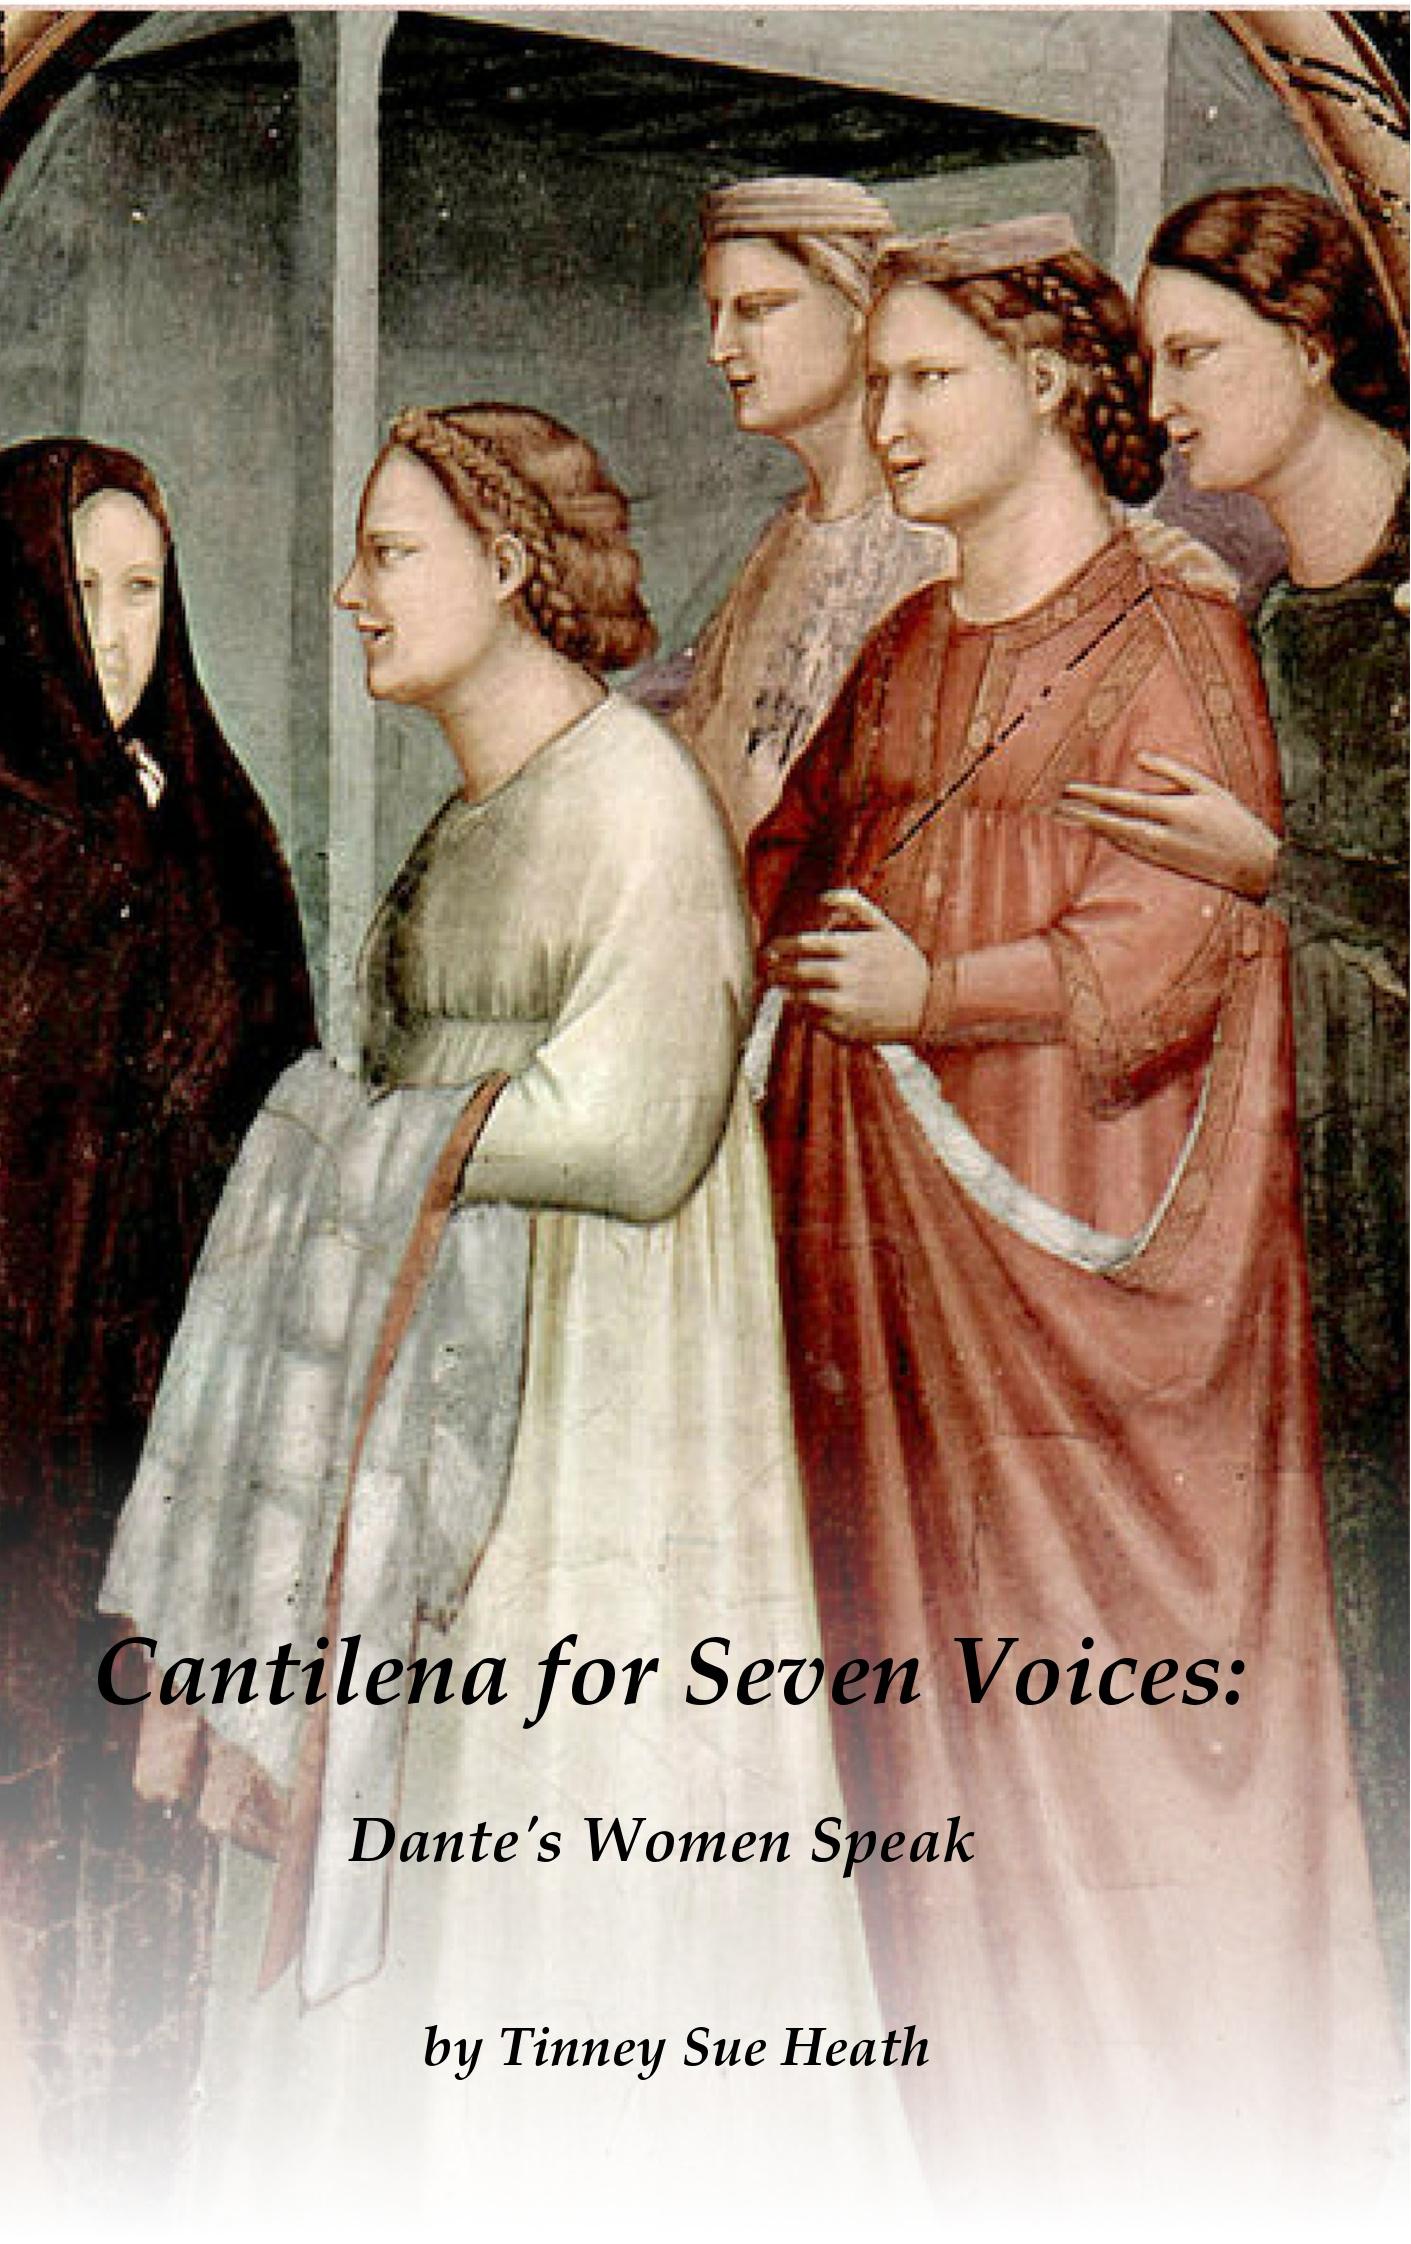 CantilenaBookcover2.jpg